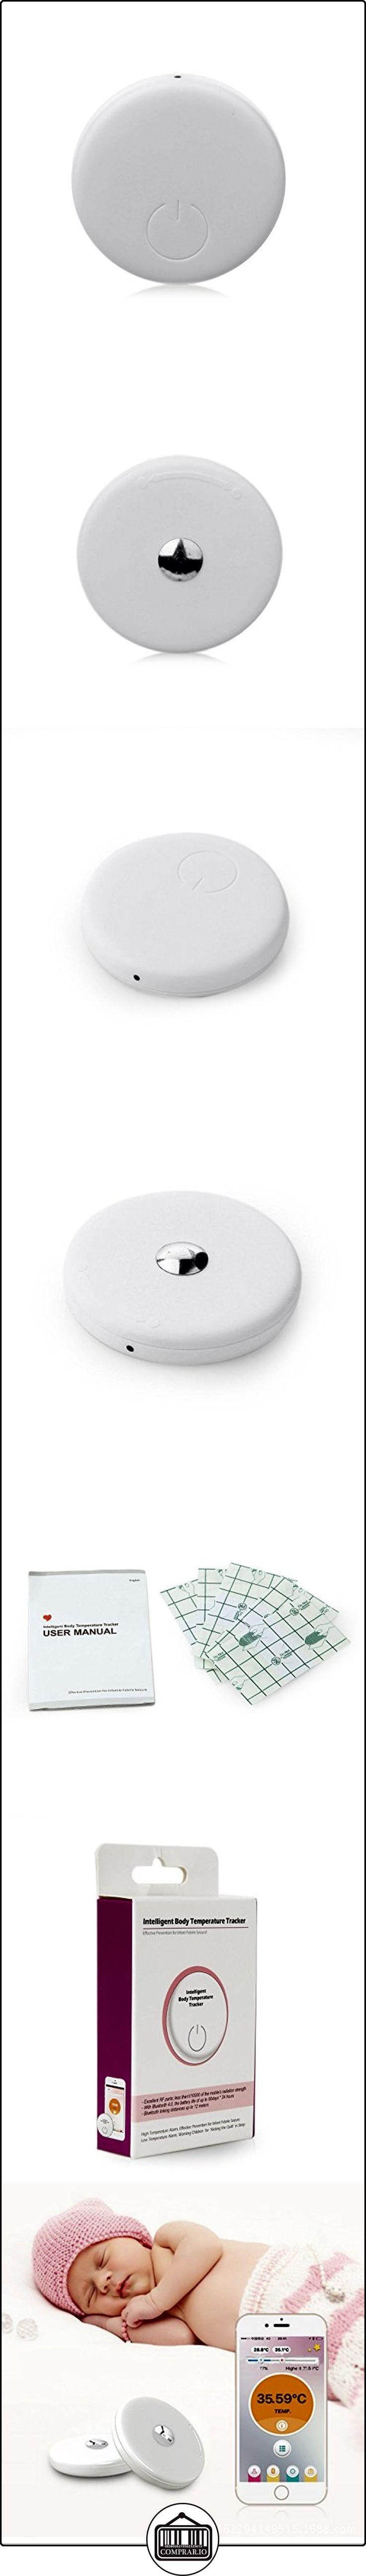 Rubility®Mini inteligente bebé Temperaturas Rastreador del sensor de temperatura del termómetro digital para Android / iOS Blanca  ✿ Vigilabebés - Seguridad ✿ ▬► Ver oferta: http://comprar.io/goto/B01HD6OS5Q